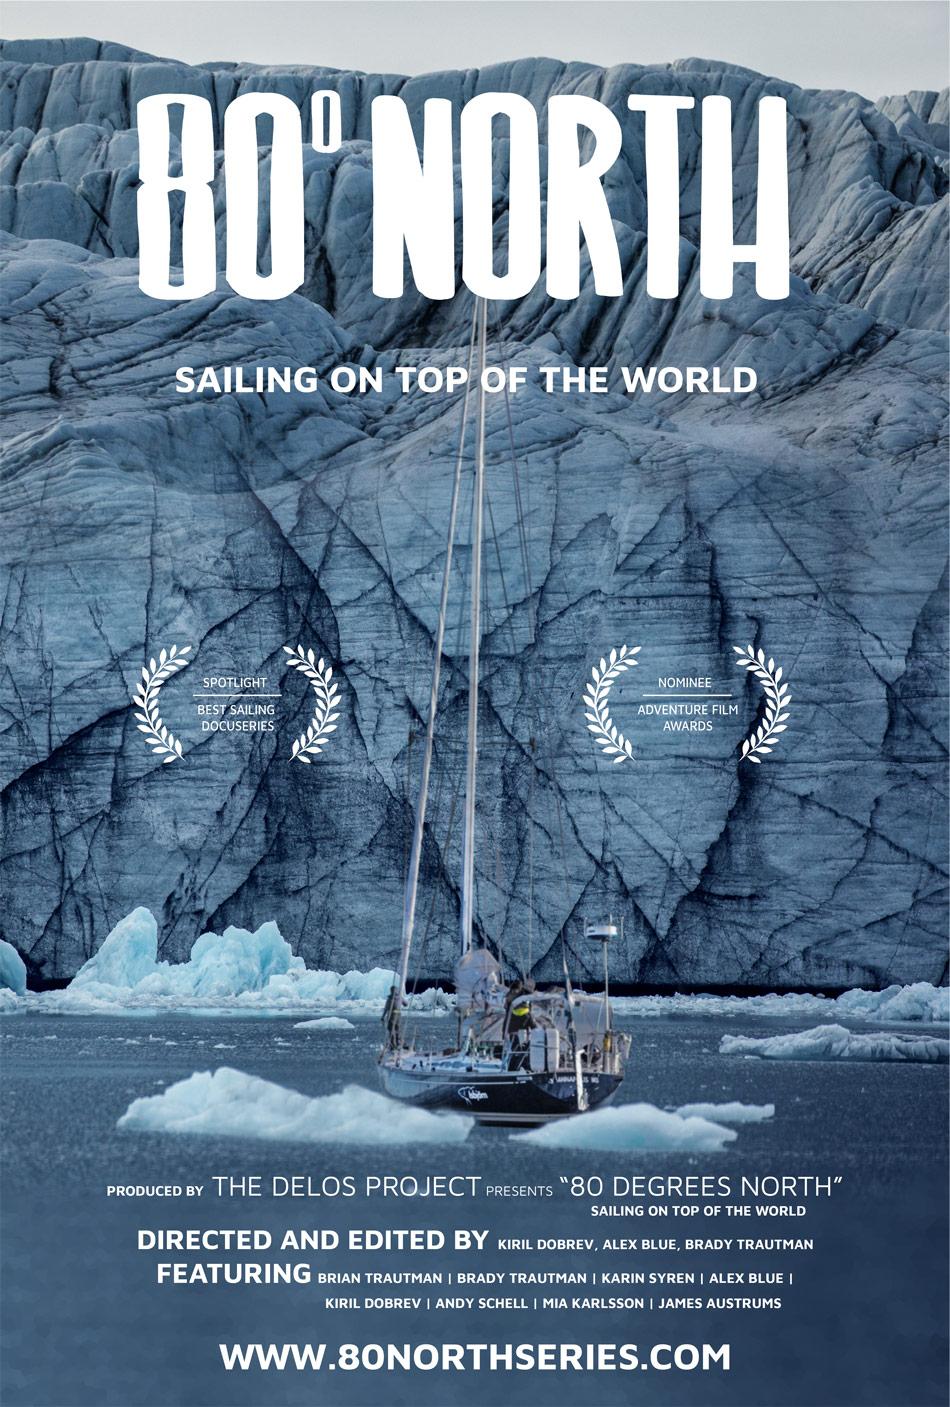 80-north-poster-22.jpg